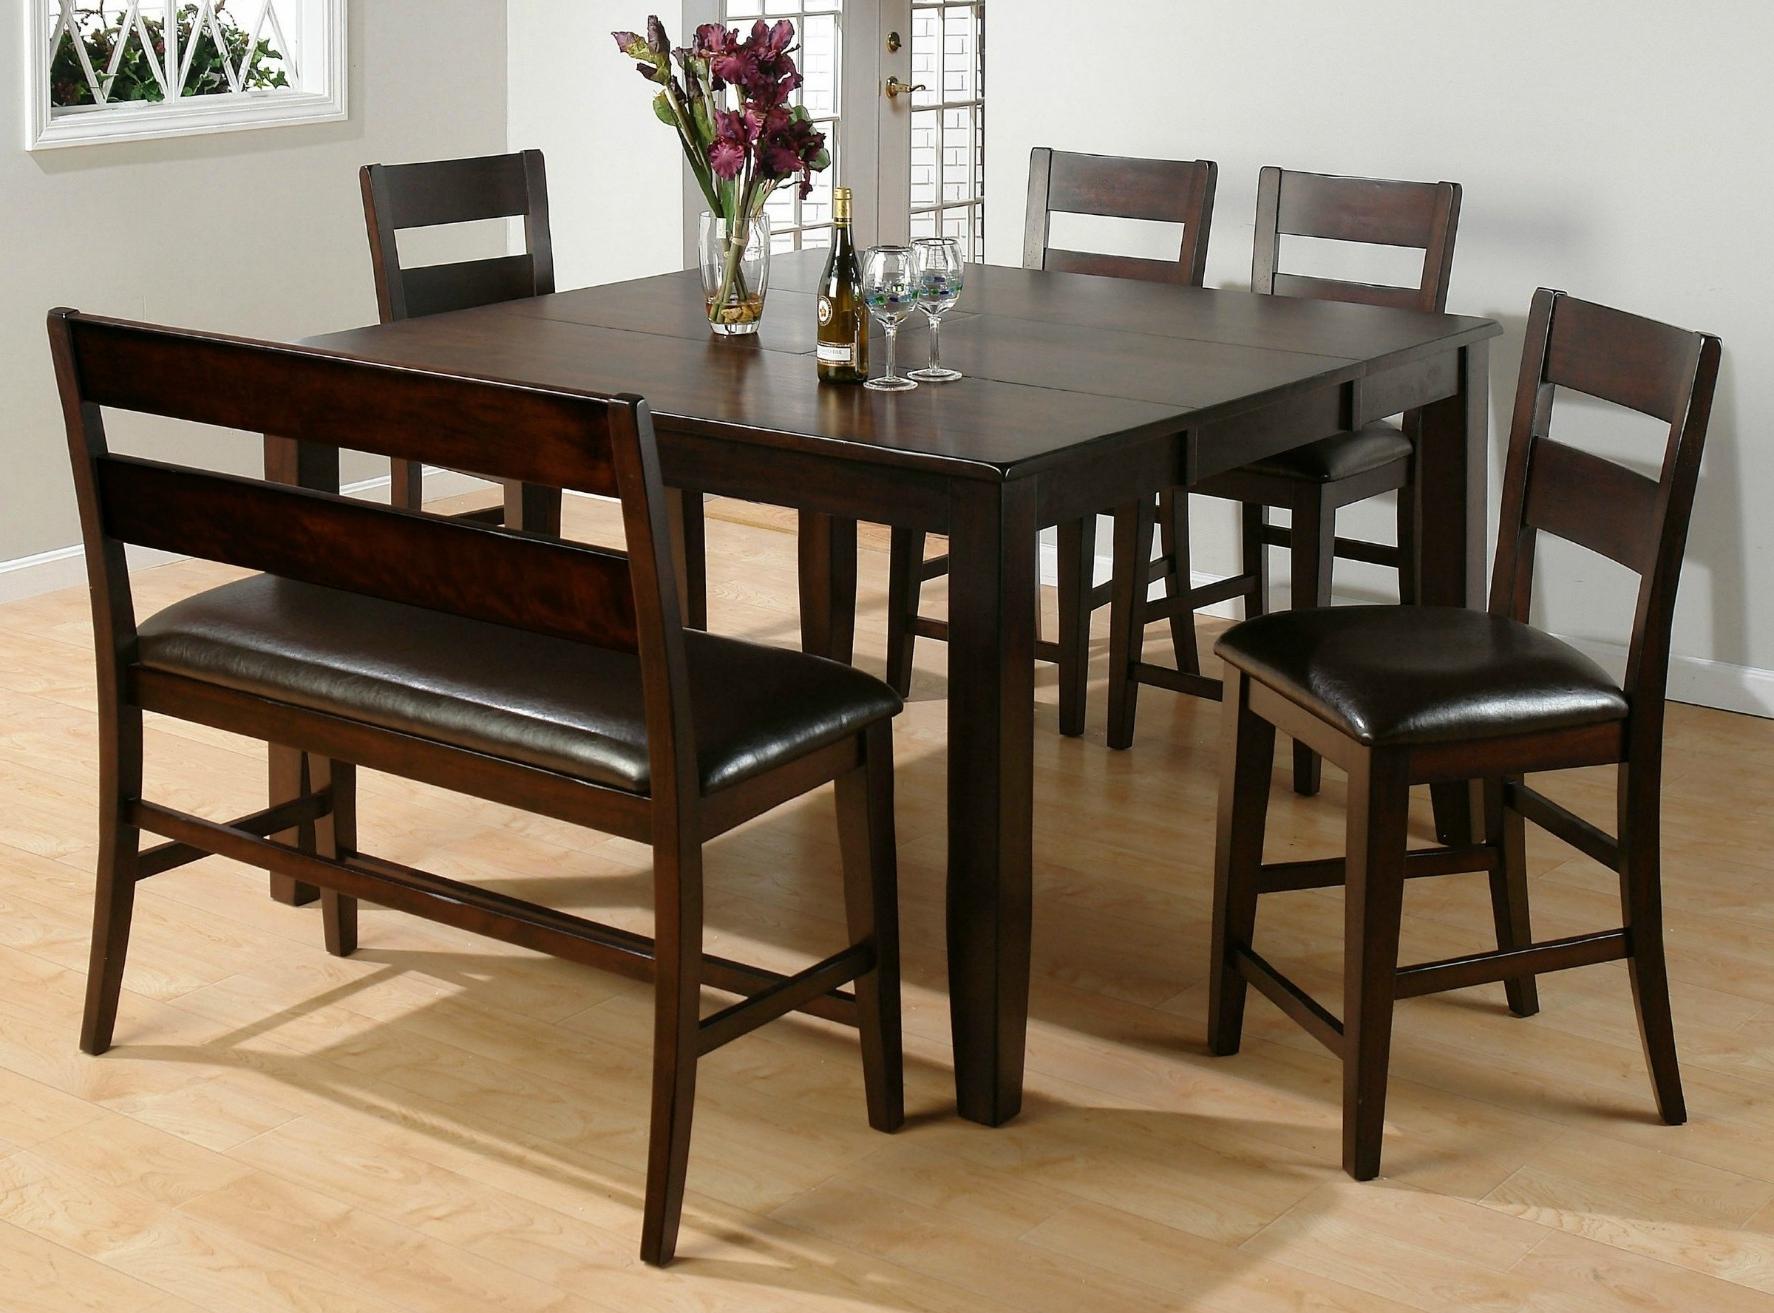 2017 Dark Brown Wood Dining Tables Regarding Furniture. Sturdy Dining Table With Bench: Dark Brown Wooden Finish (Gallery 22 of 25)